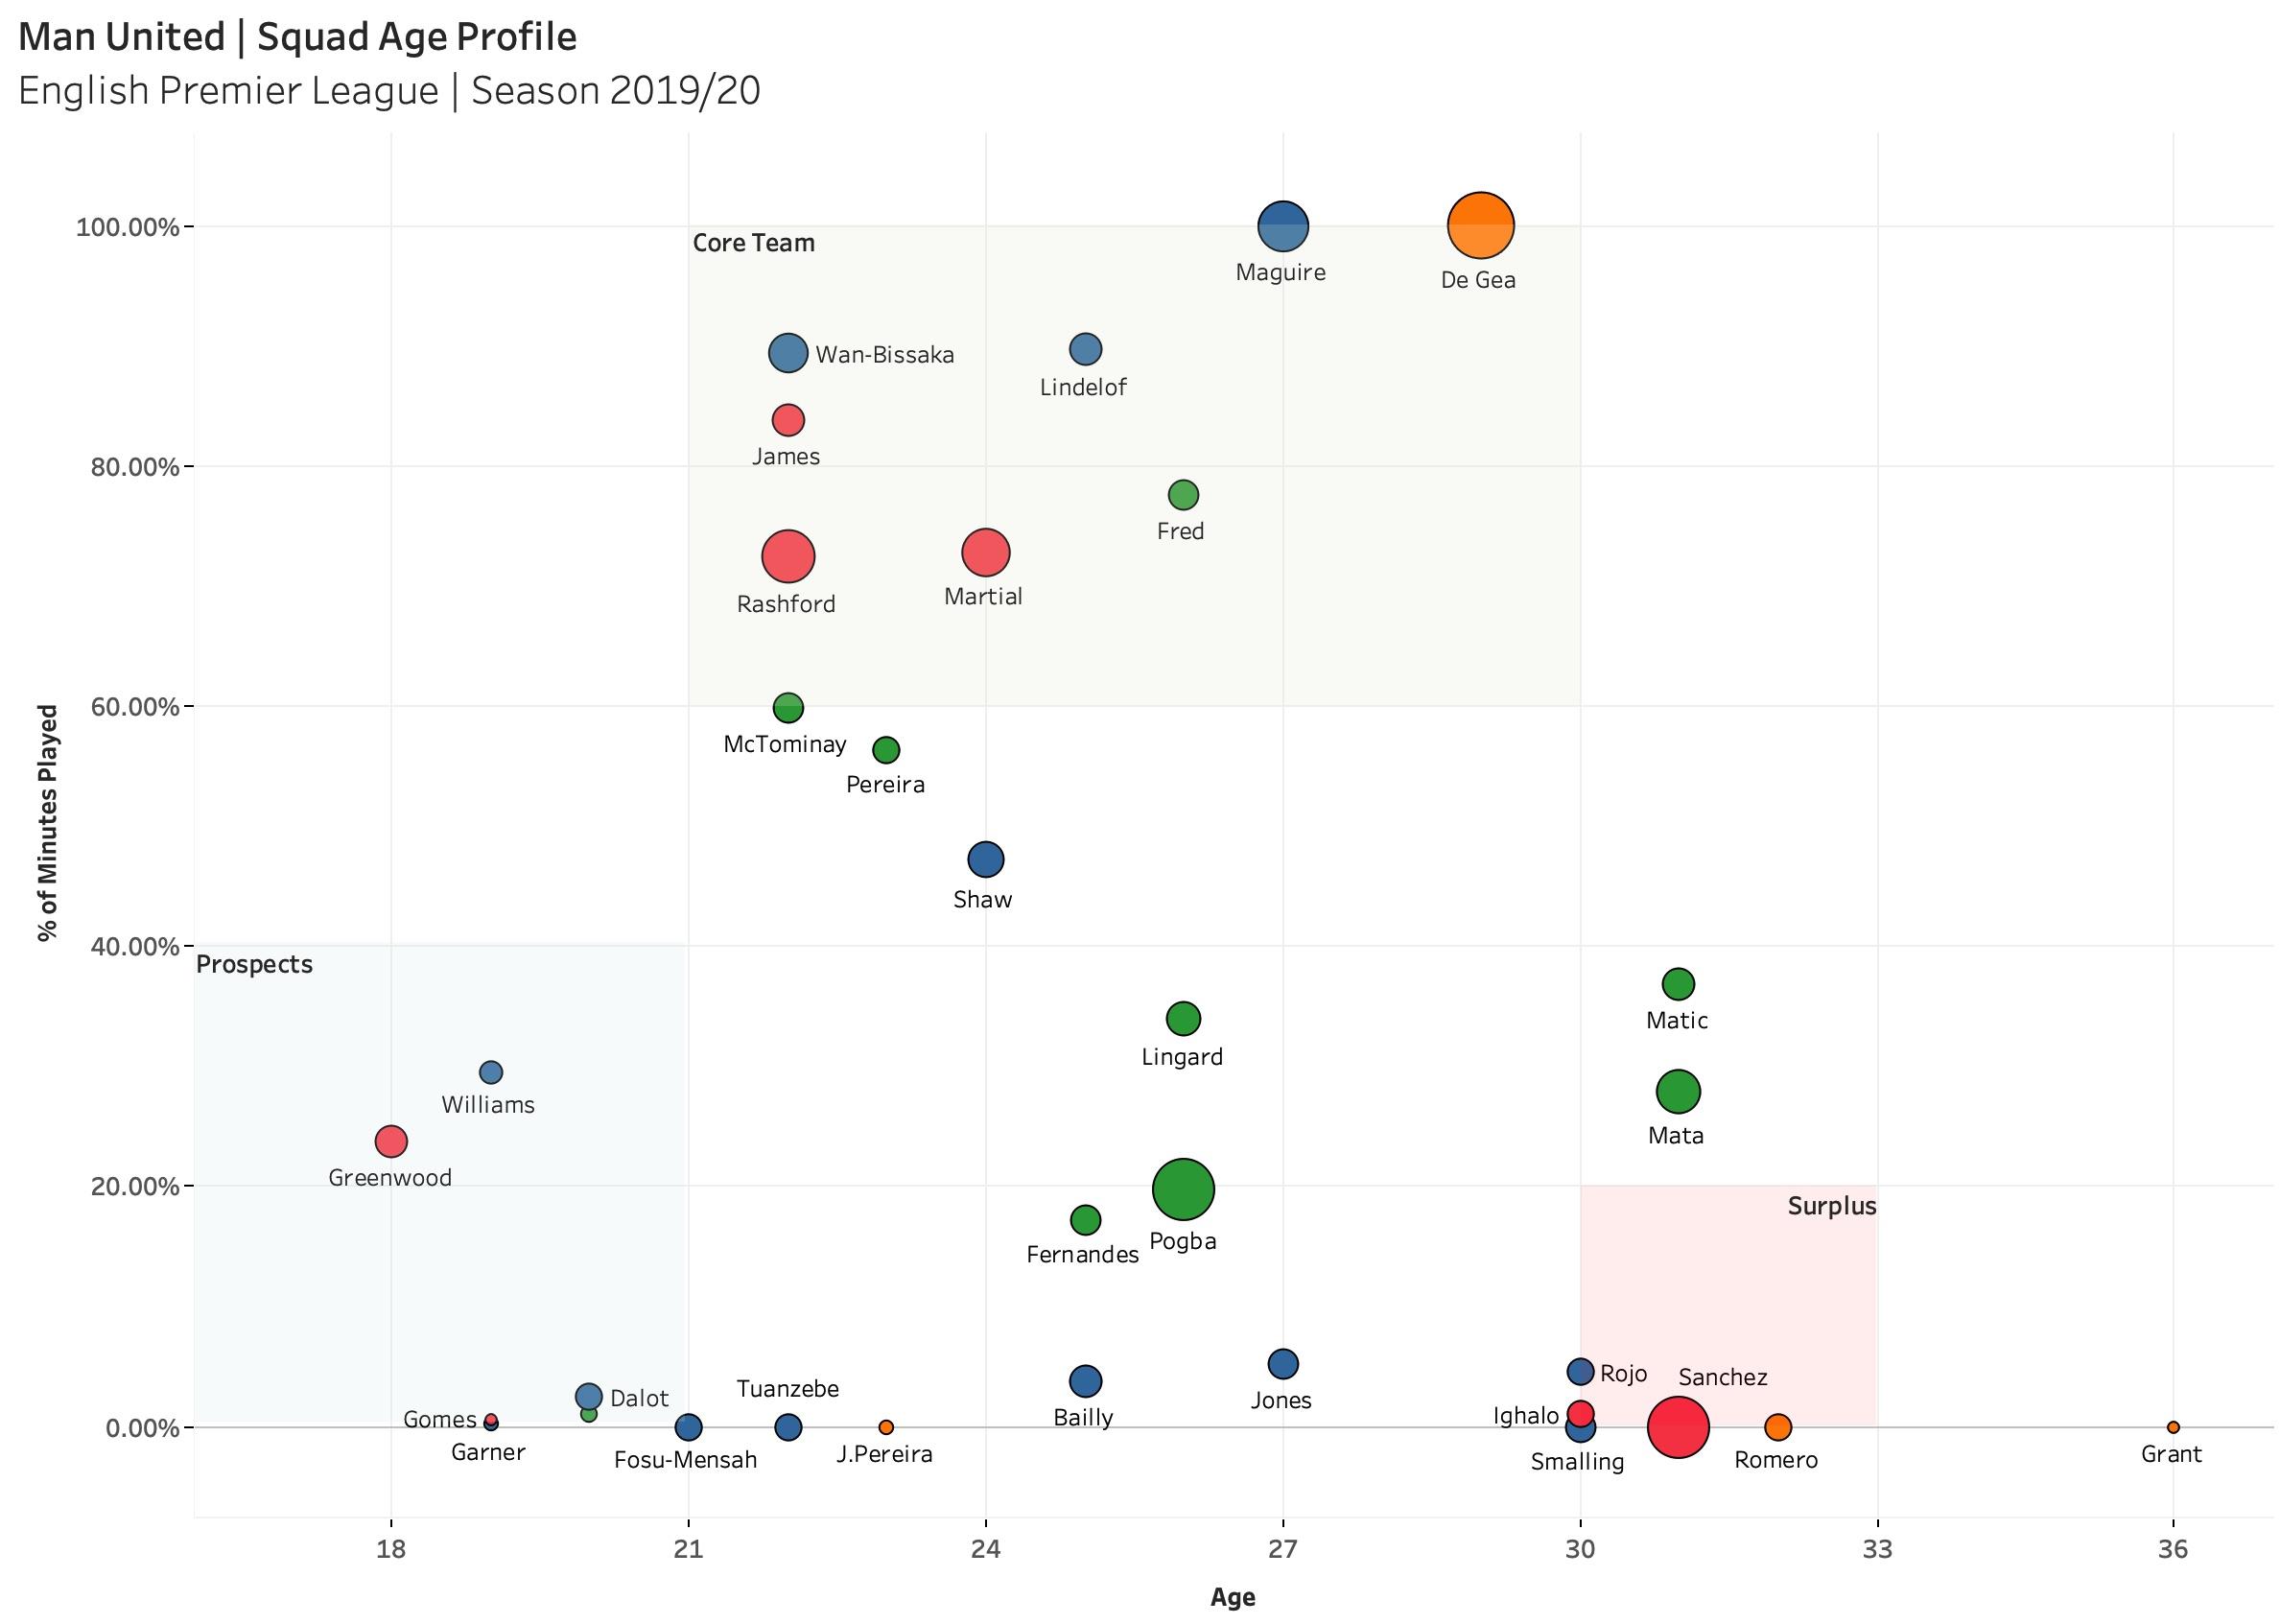 Man United's transfer policy - Data Analysis statistics